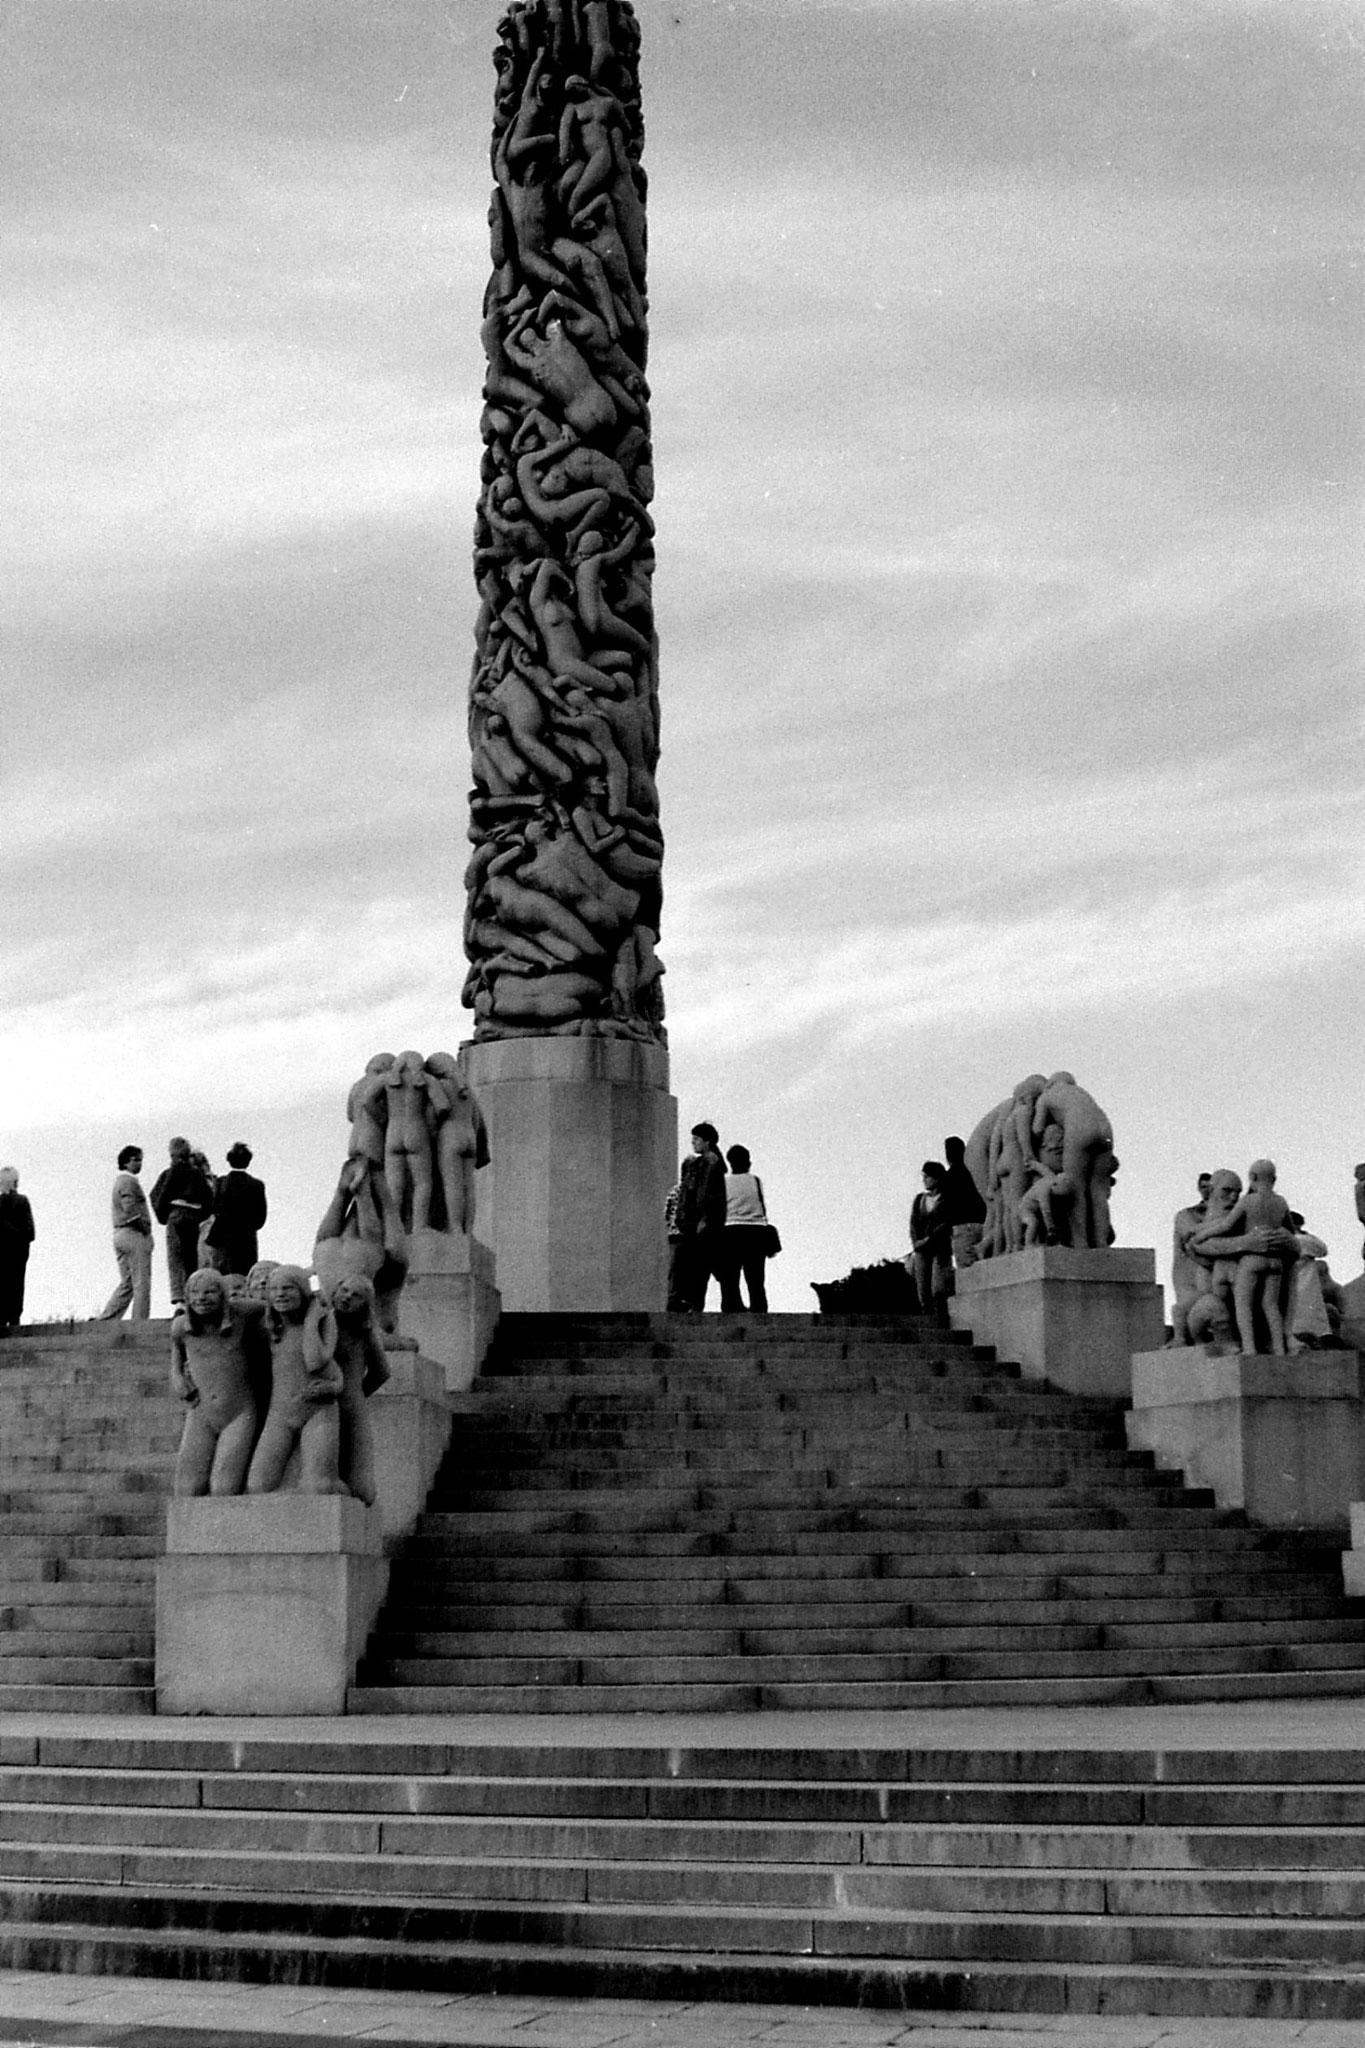 17/9/1988: 14: Vigeland sculpture park